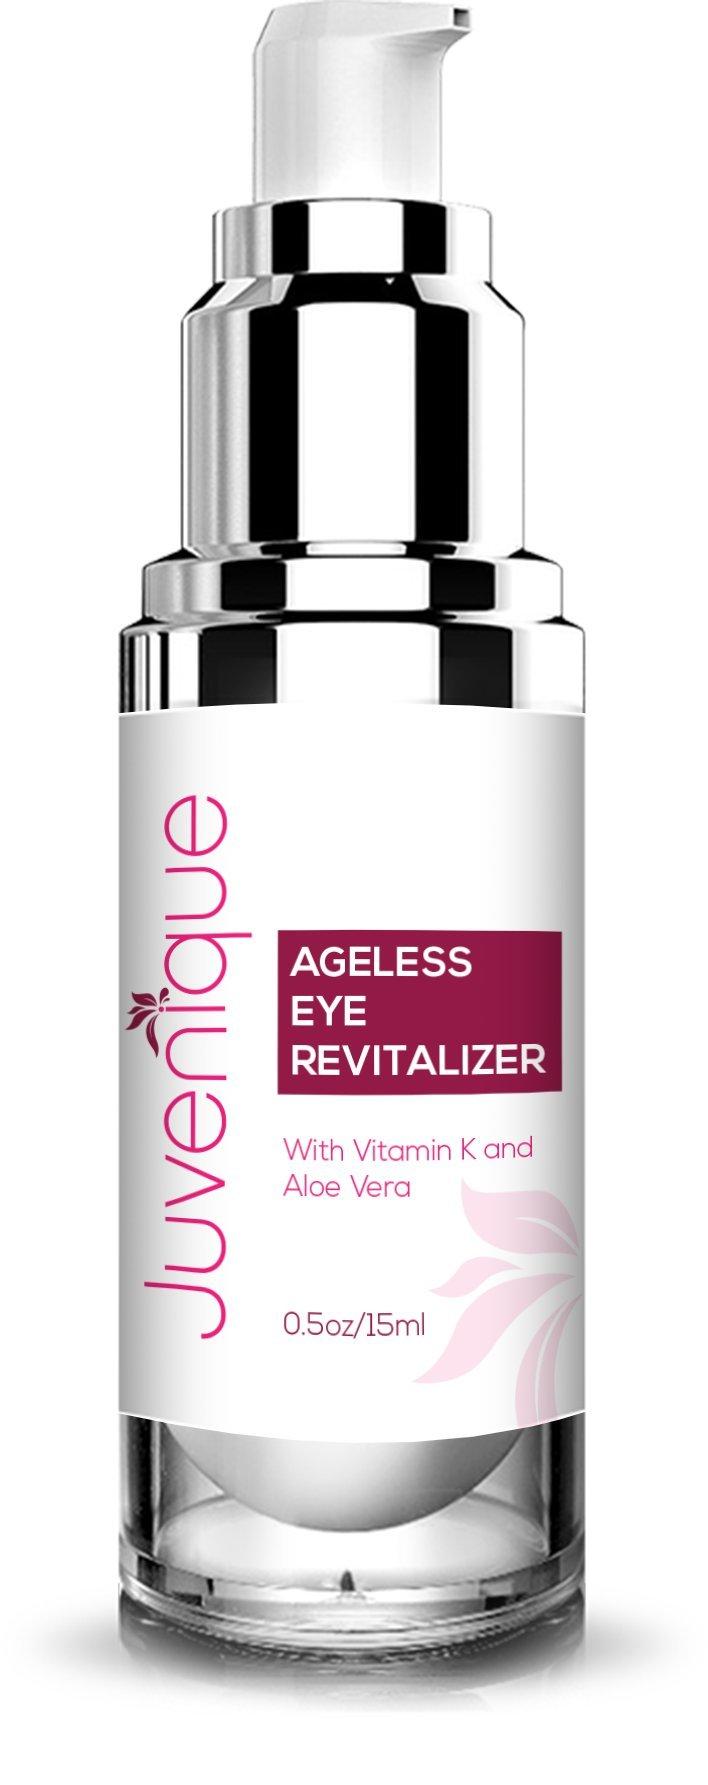 Juvenique Ageless Eye Revitalizer- With Vitamin K and Aloe Vera